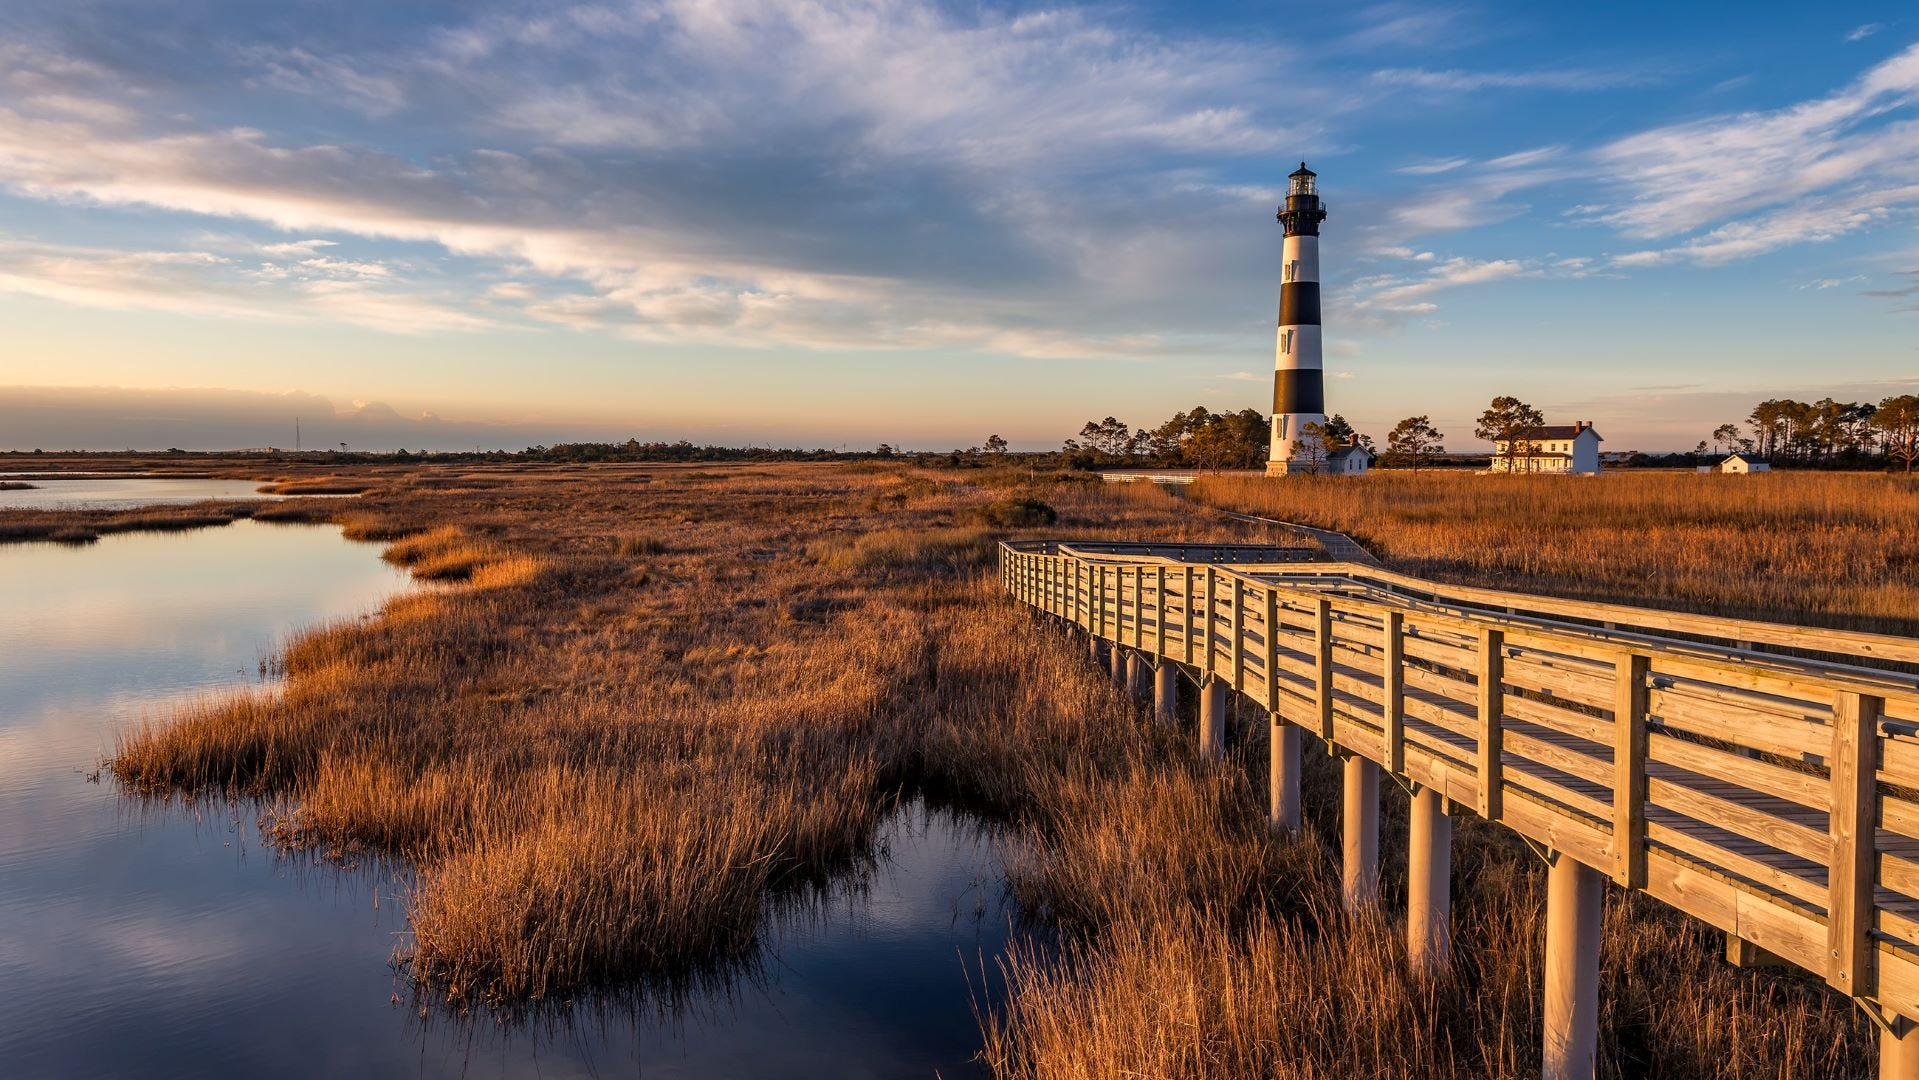 Cape Hatteras Lighthouse at dusk, Buxton, North Carolina.